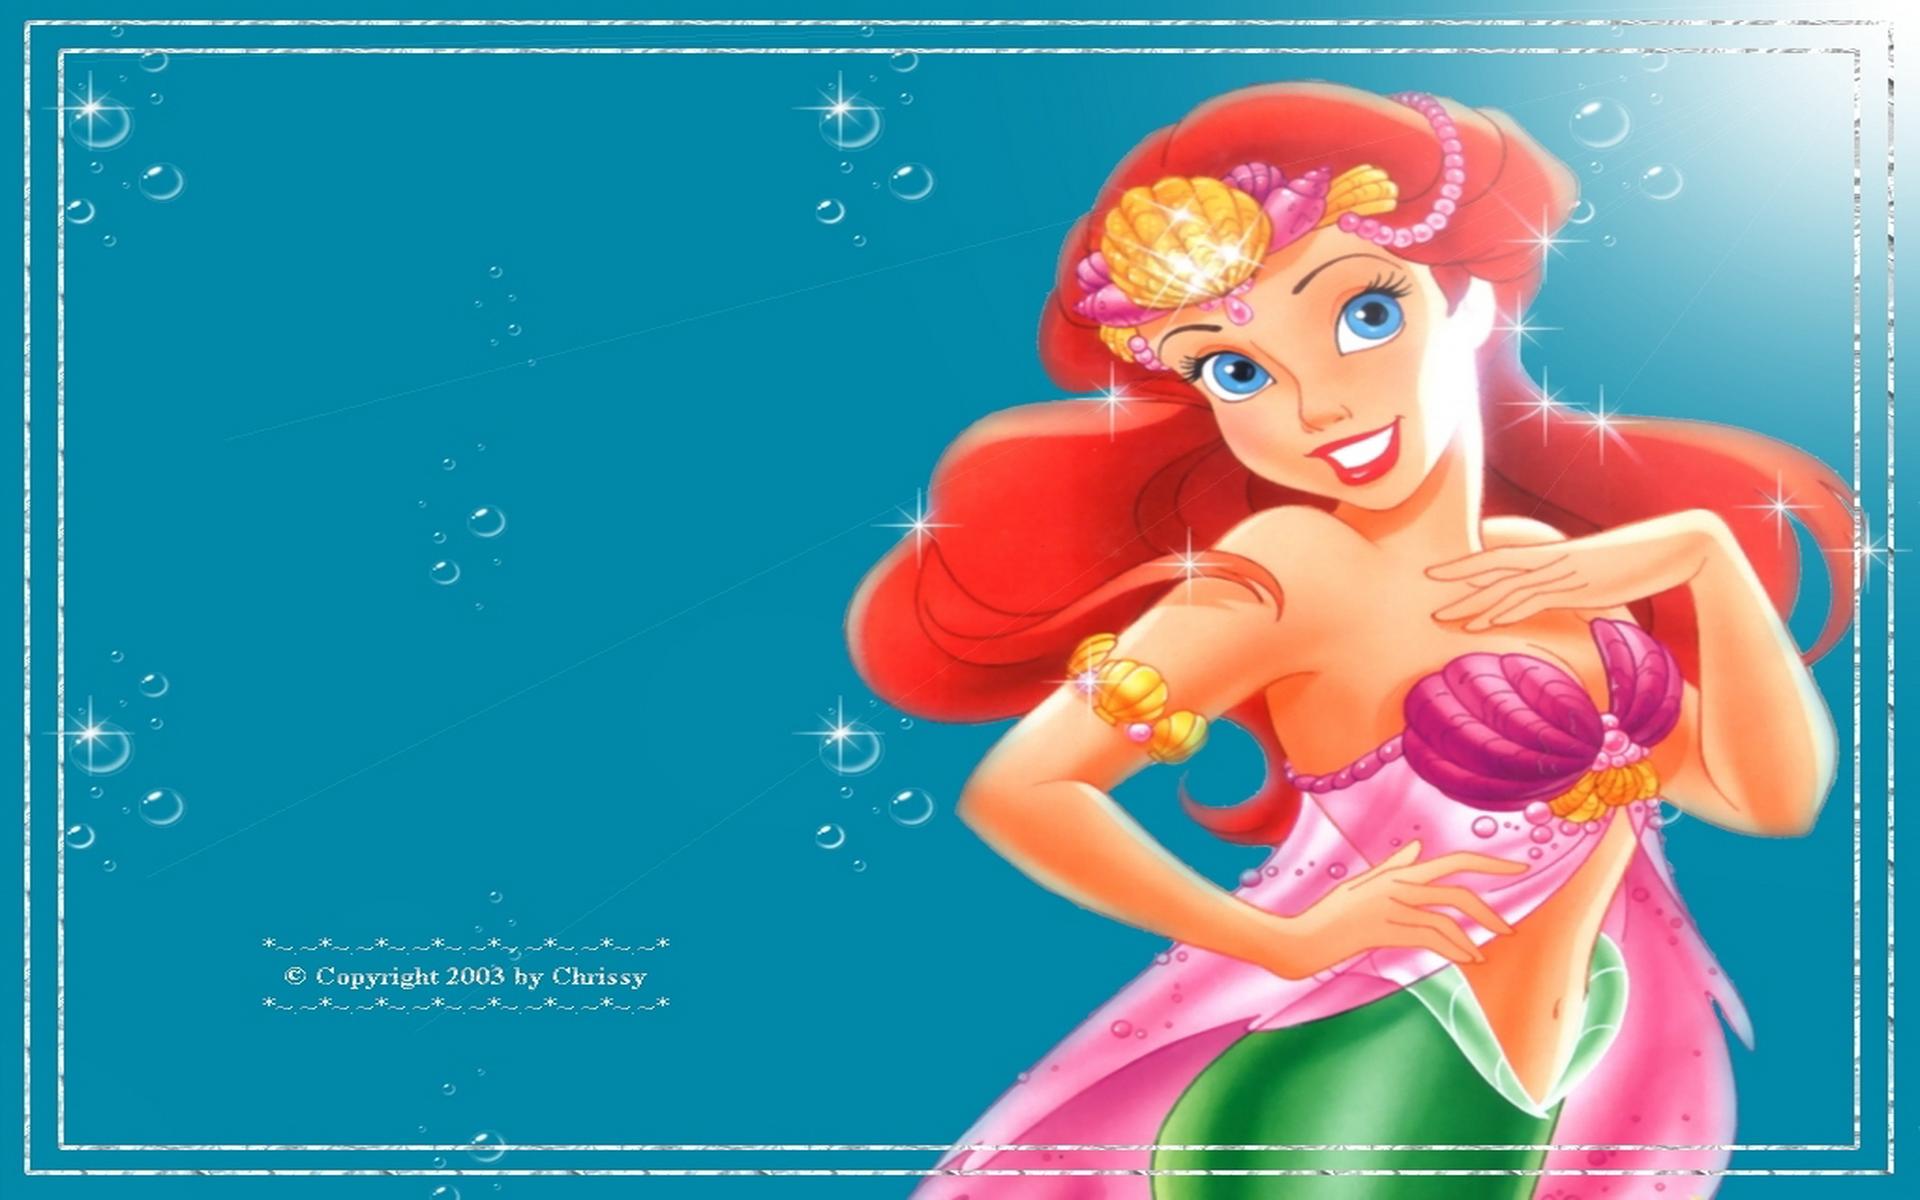 Disney Wallpaper HD 3D Widescreen